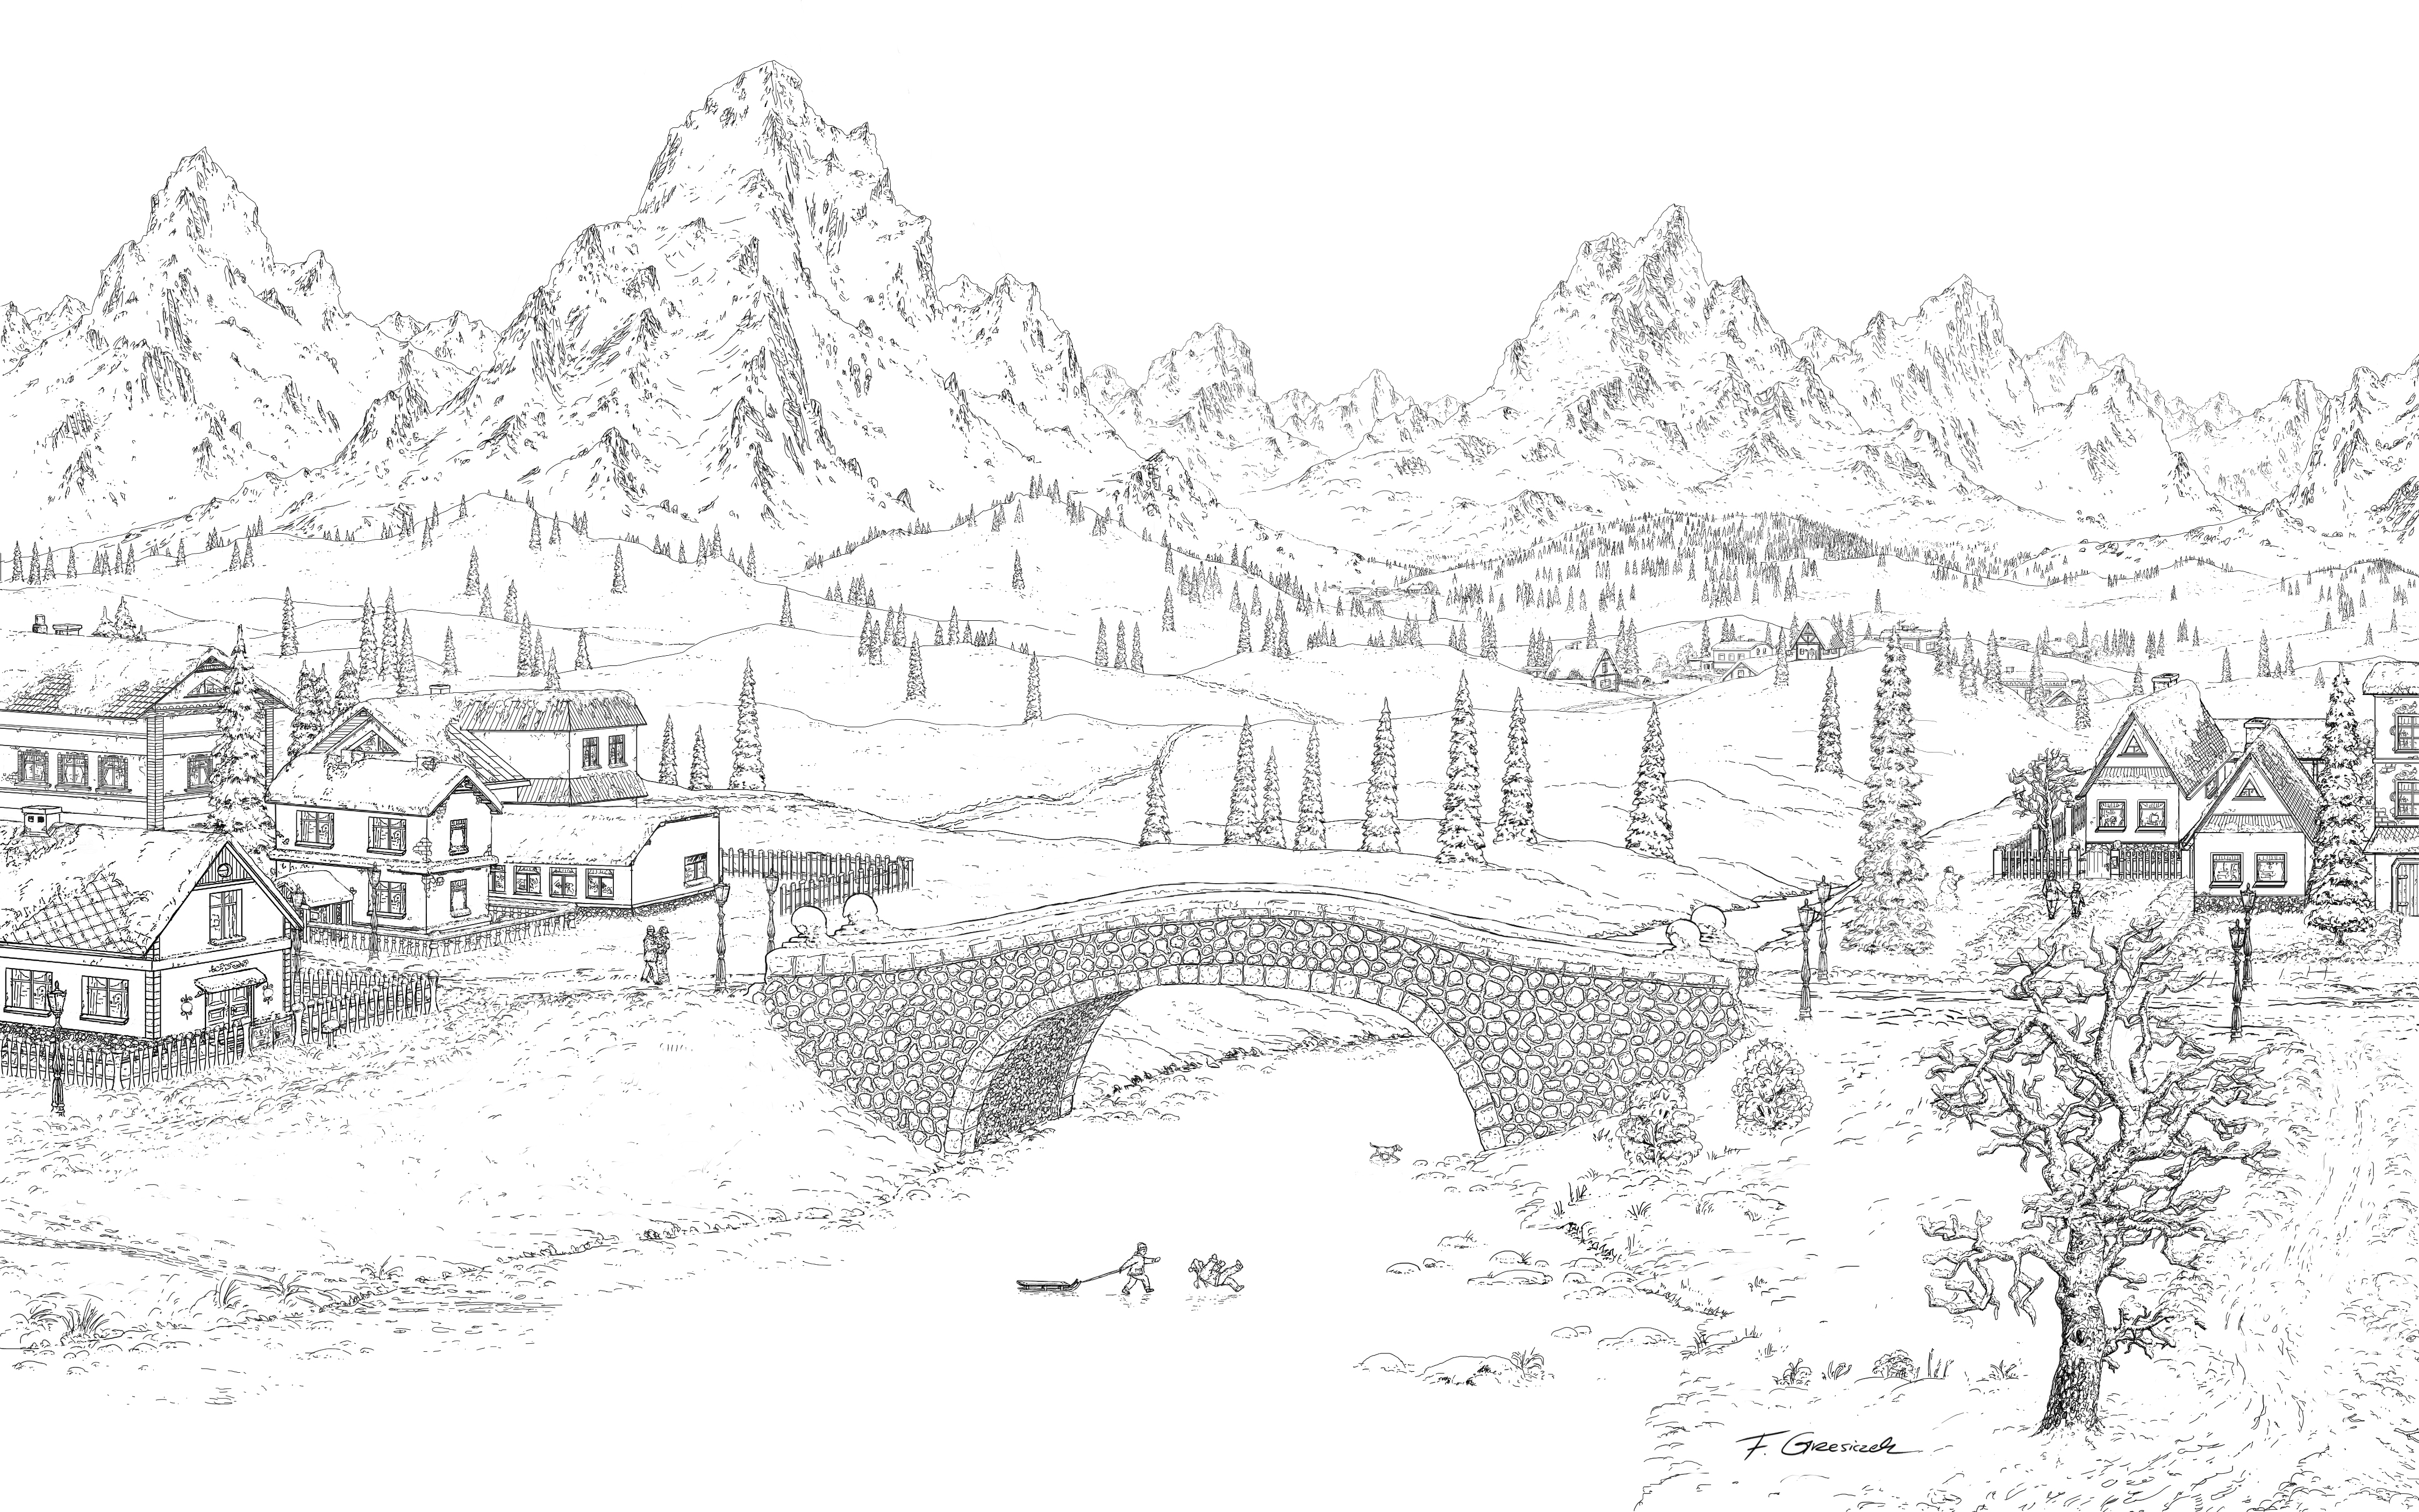 Bridge_lines by Fel-X